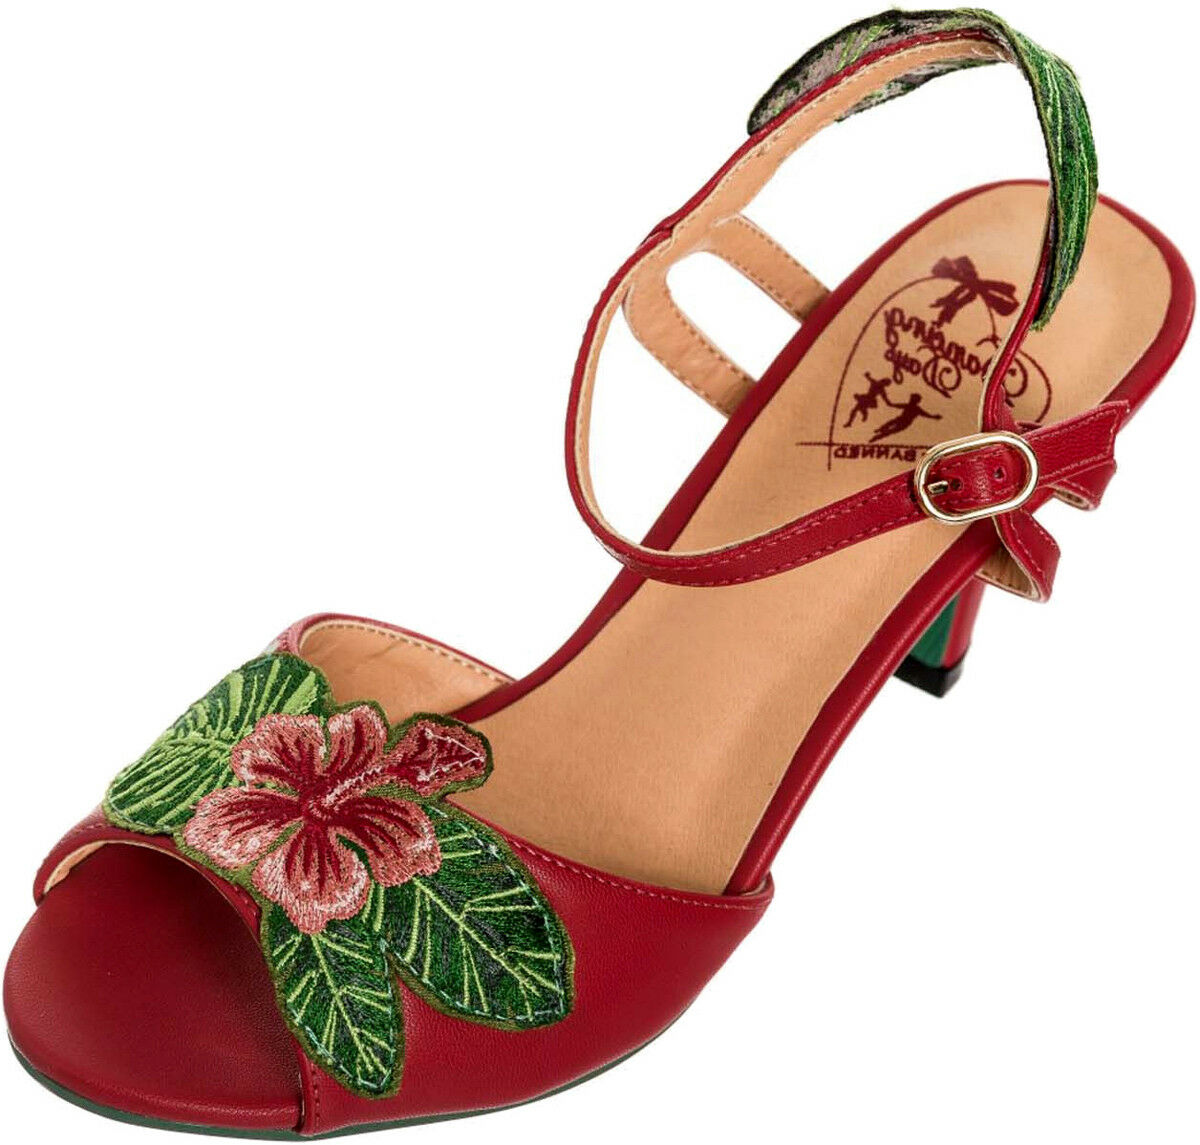 Dancing Days APRIL Aloha Tiki HIBISCUS Vintage Peep Toe SANDALETTE Rockabilly